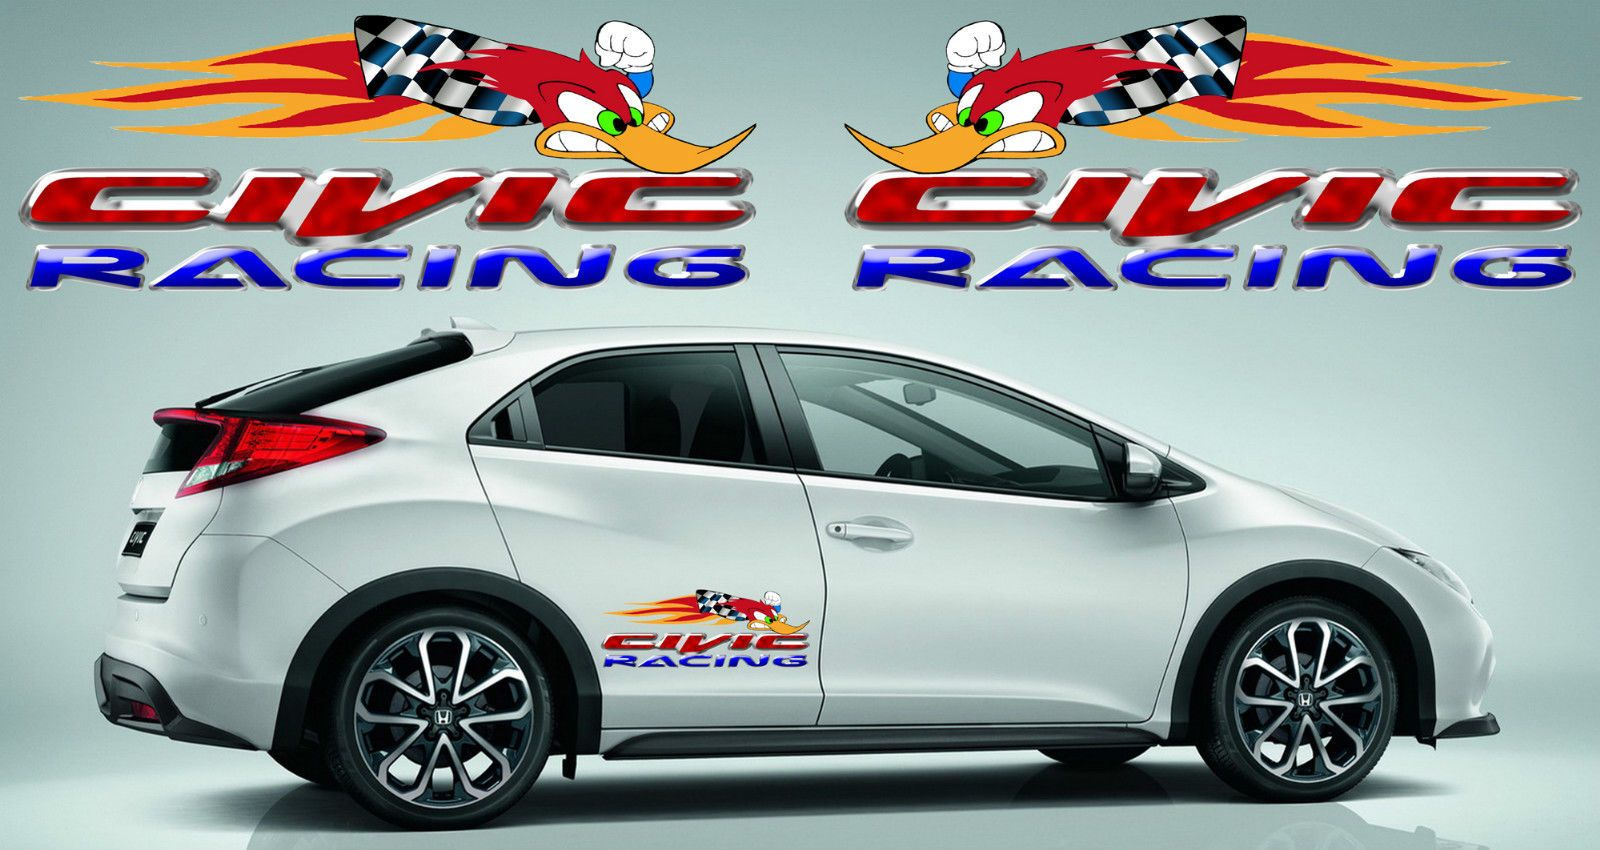 Pin by Juan Nogueira on Honda Racing Decals | Honda civic, Decals, Honda